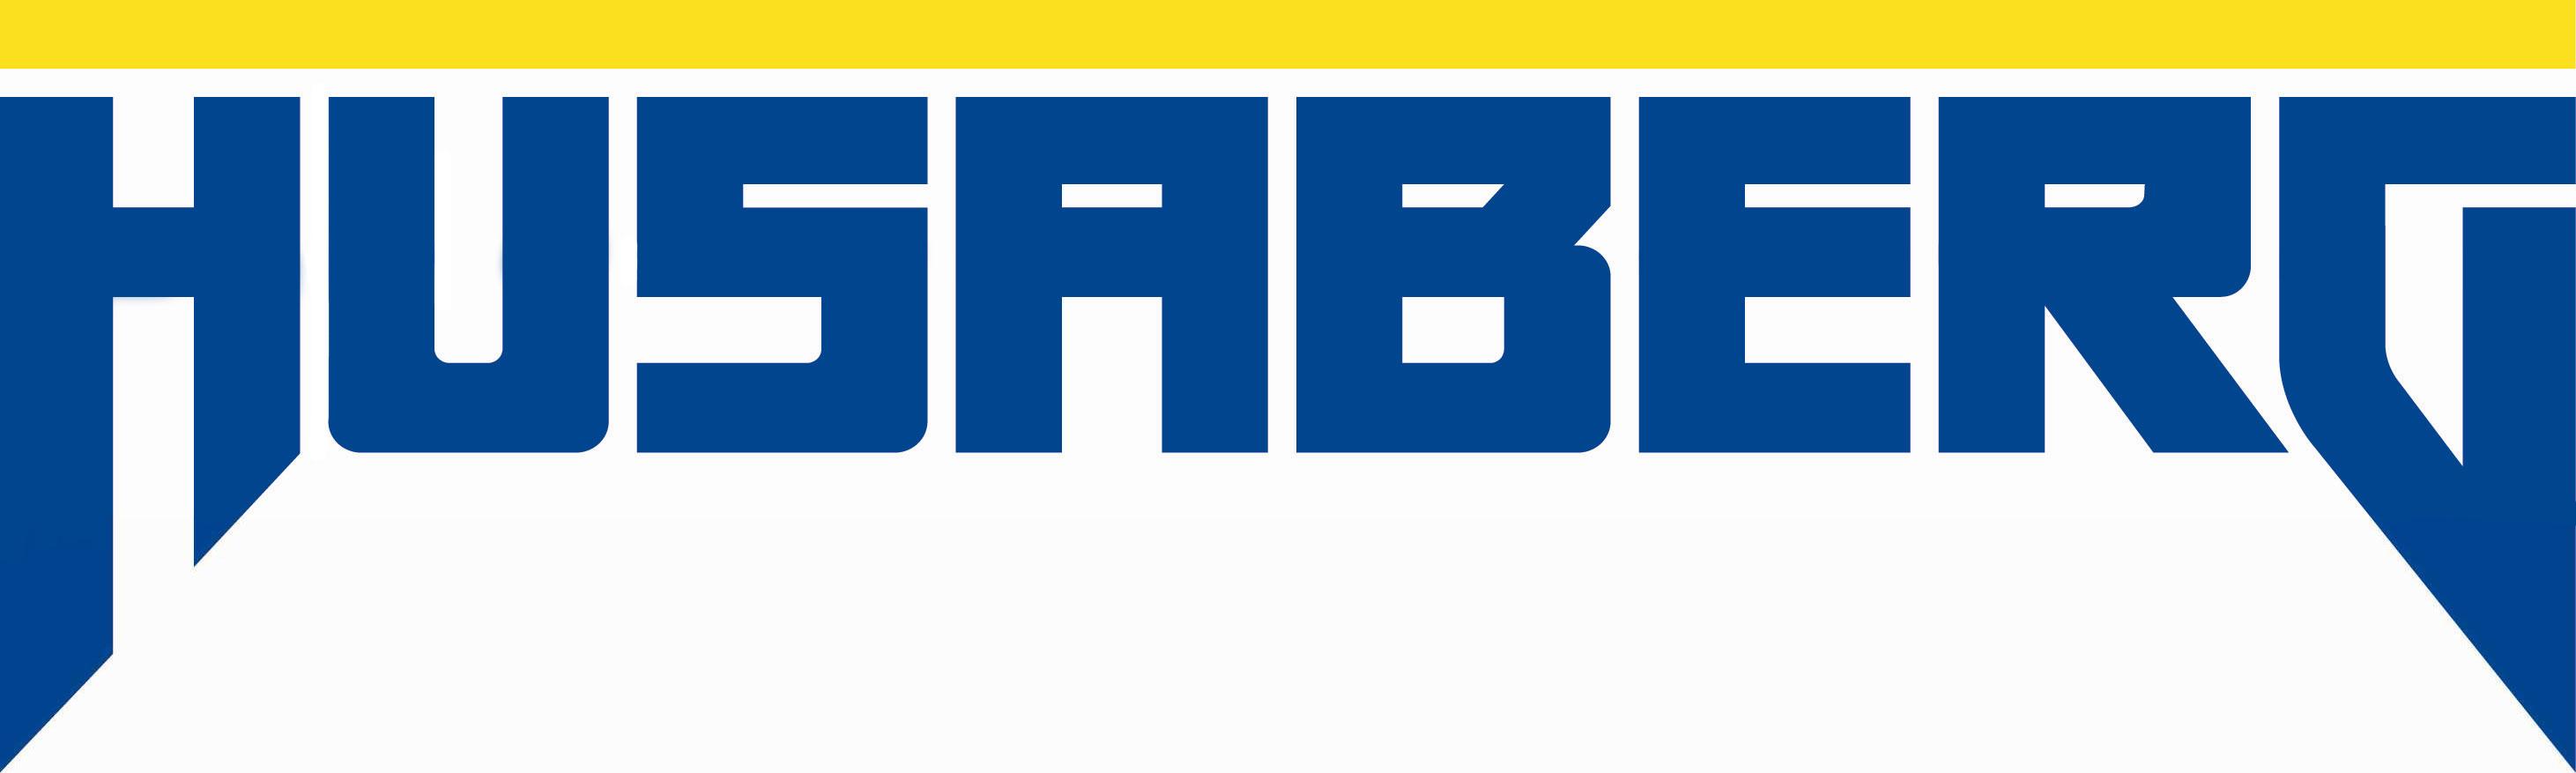 Husaberg-logo.jpg